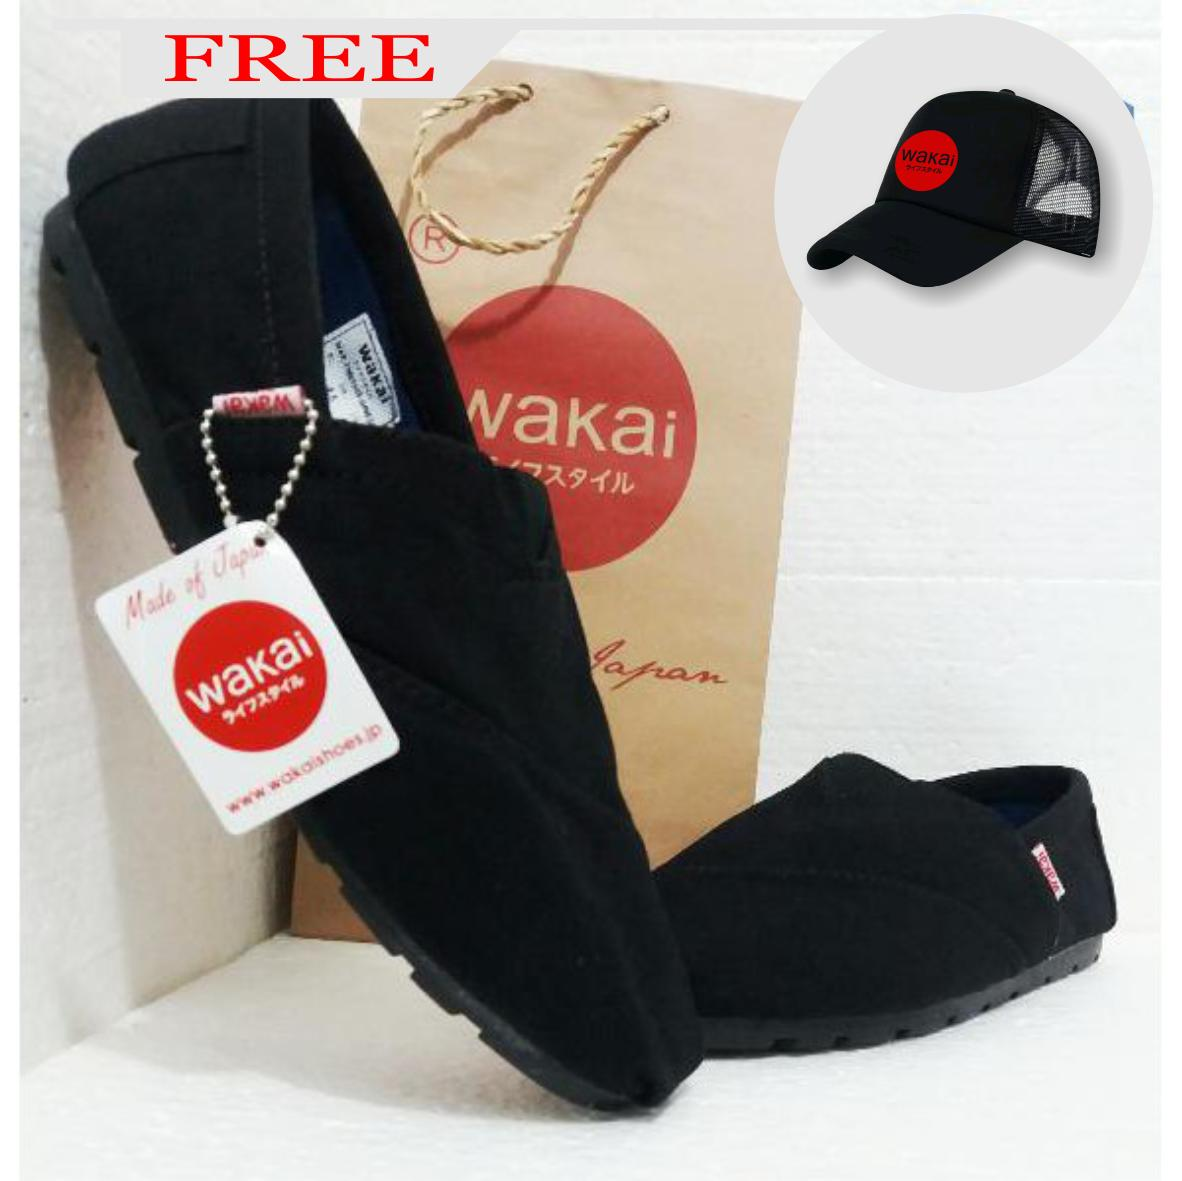 Sepatu Wakai Slip On / Pria & Wanita / Full Black